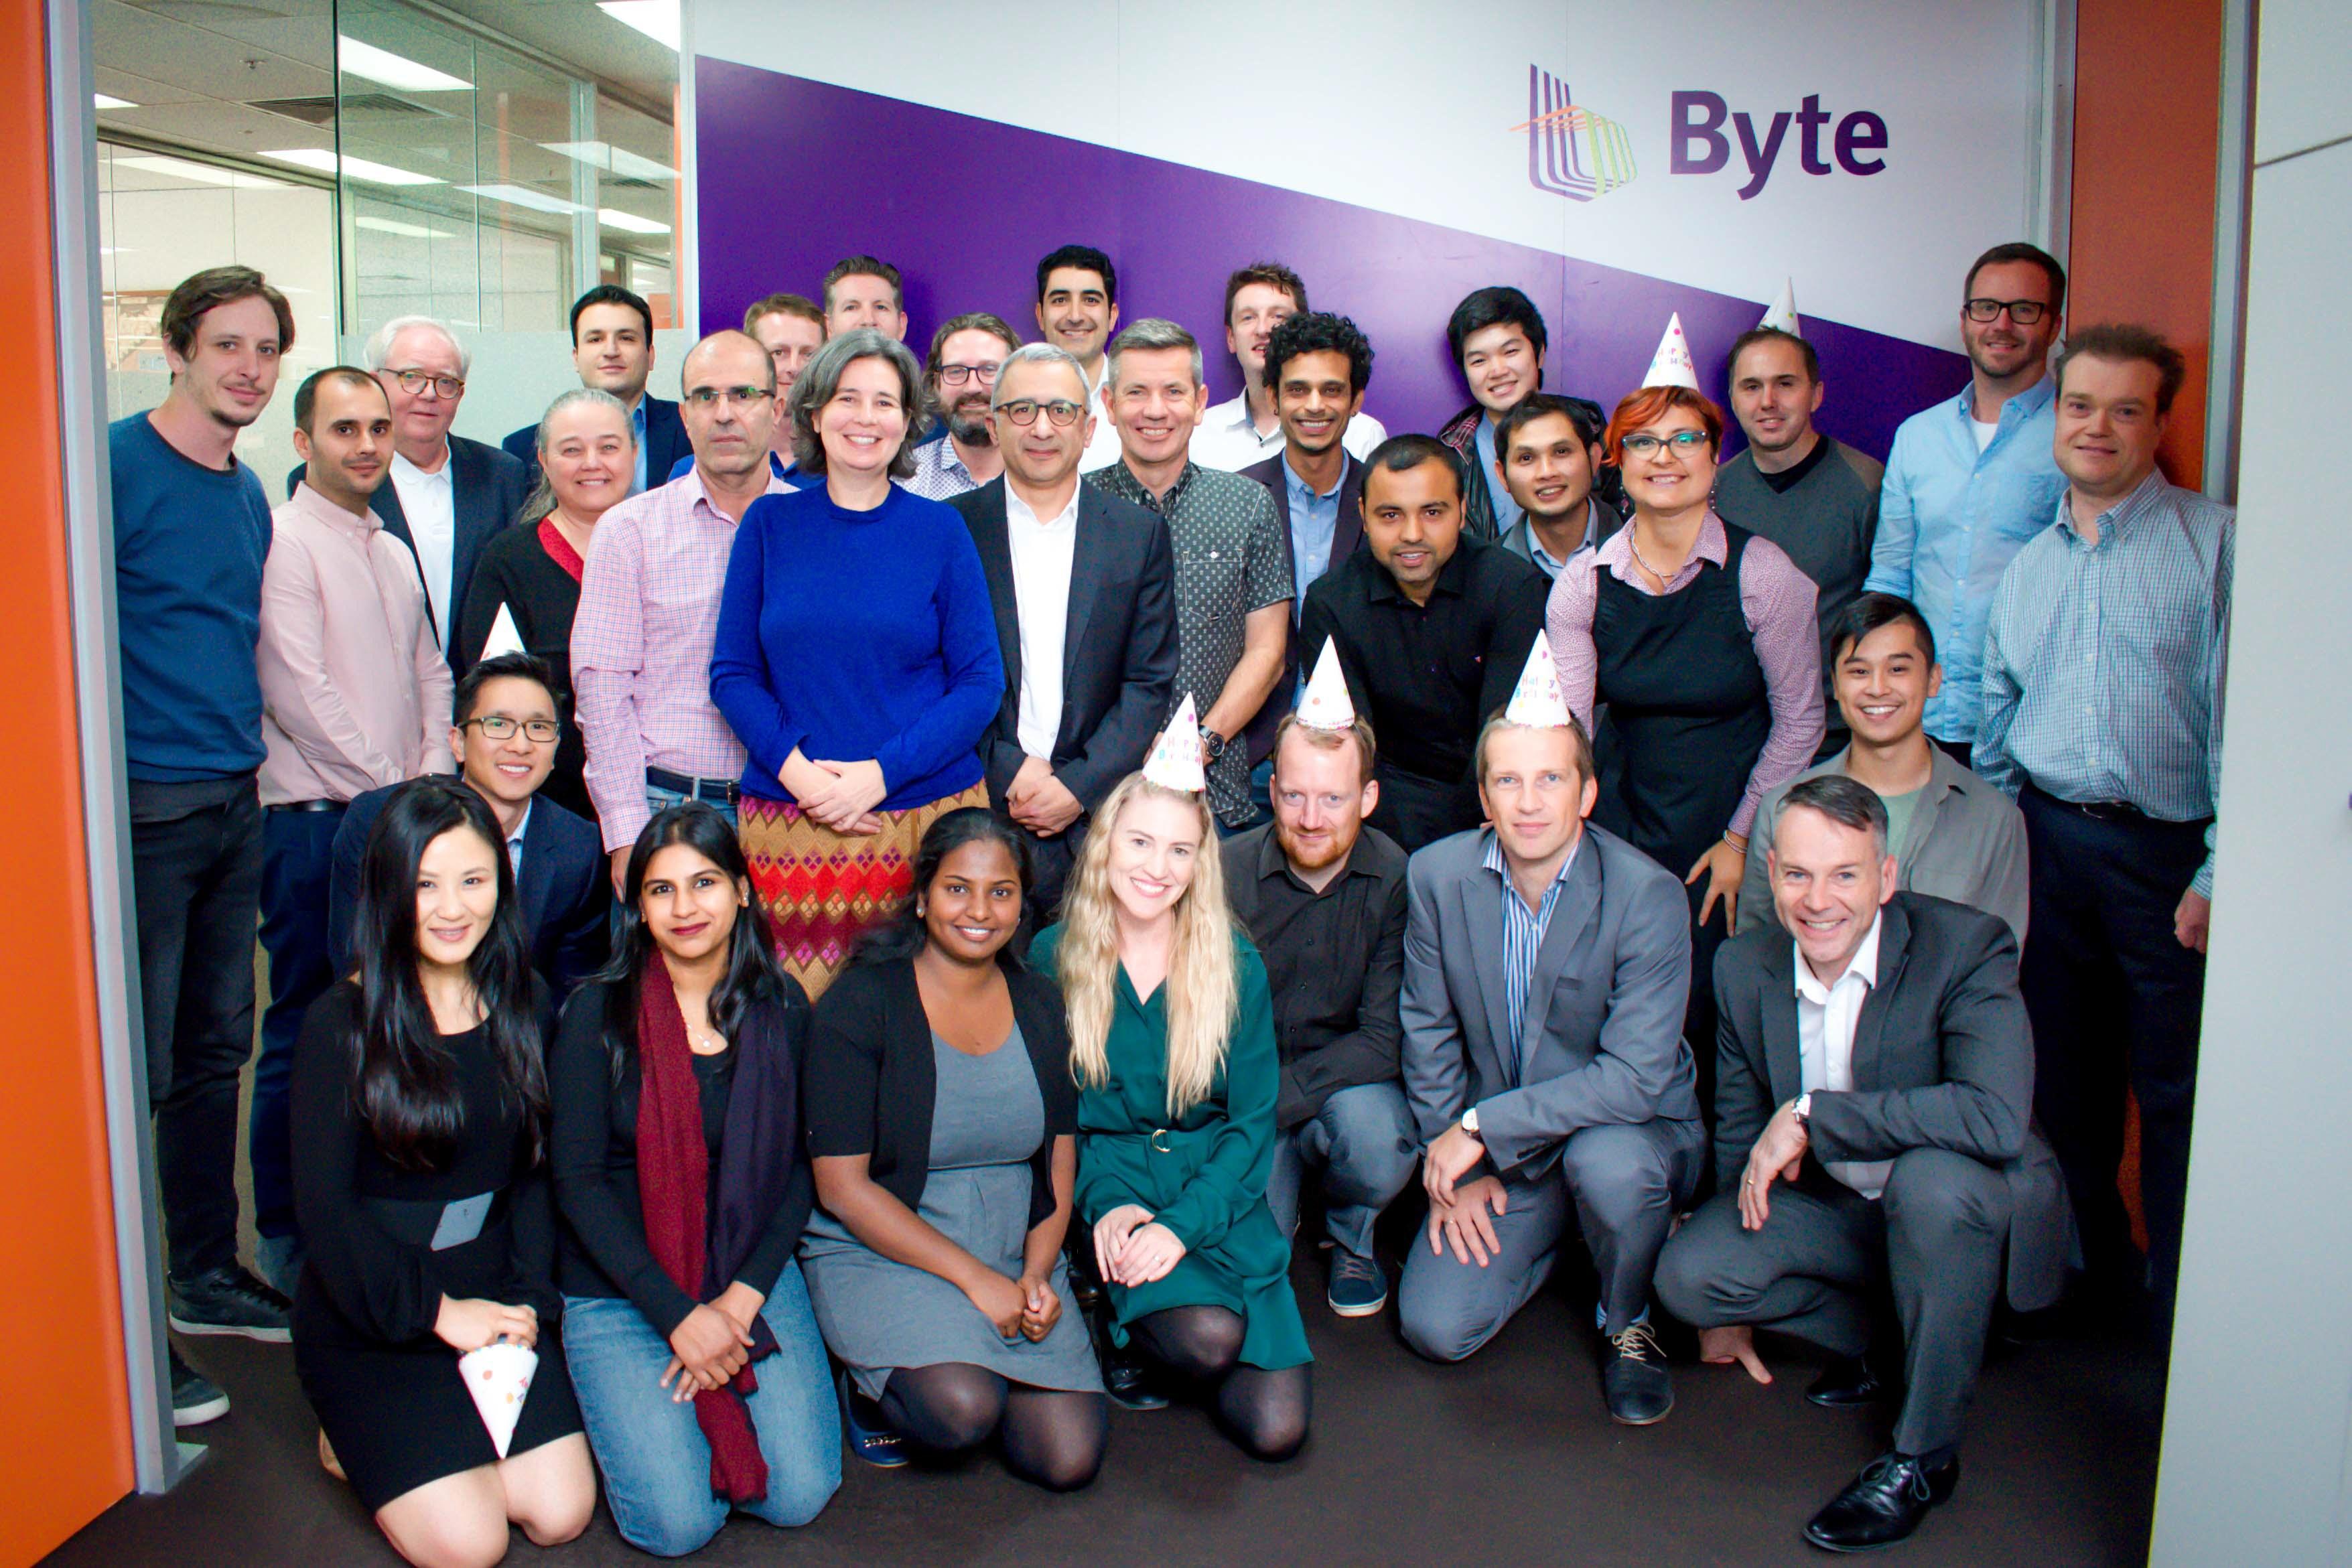 Byte's team